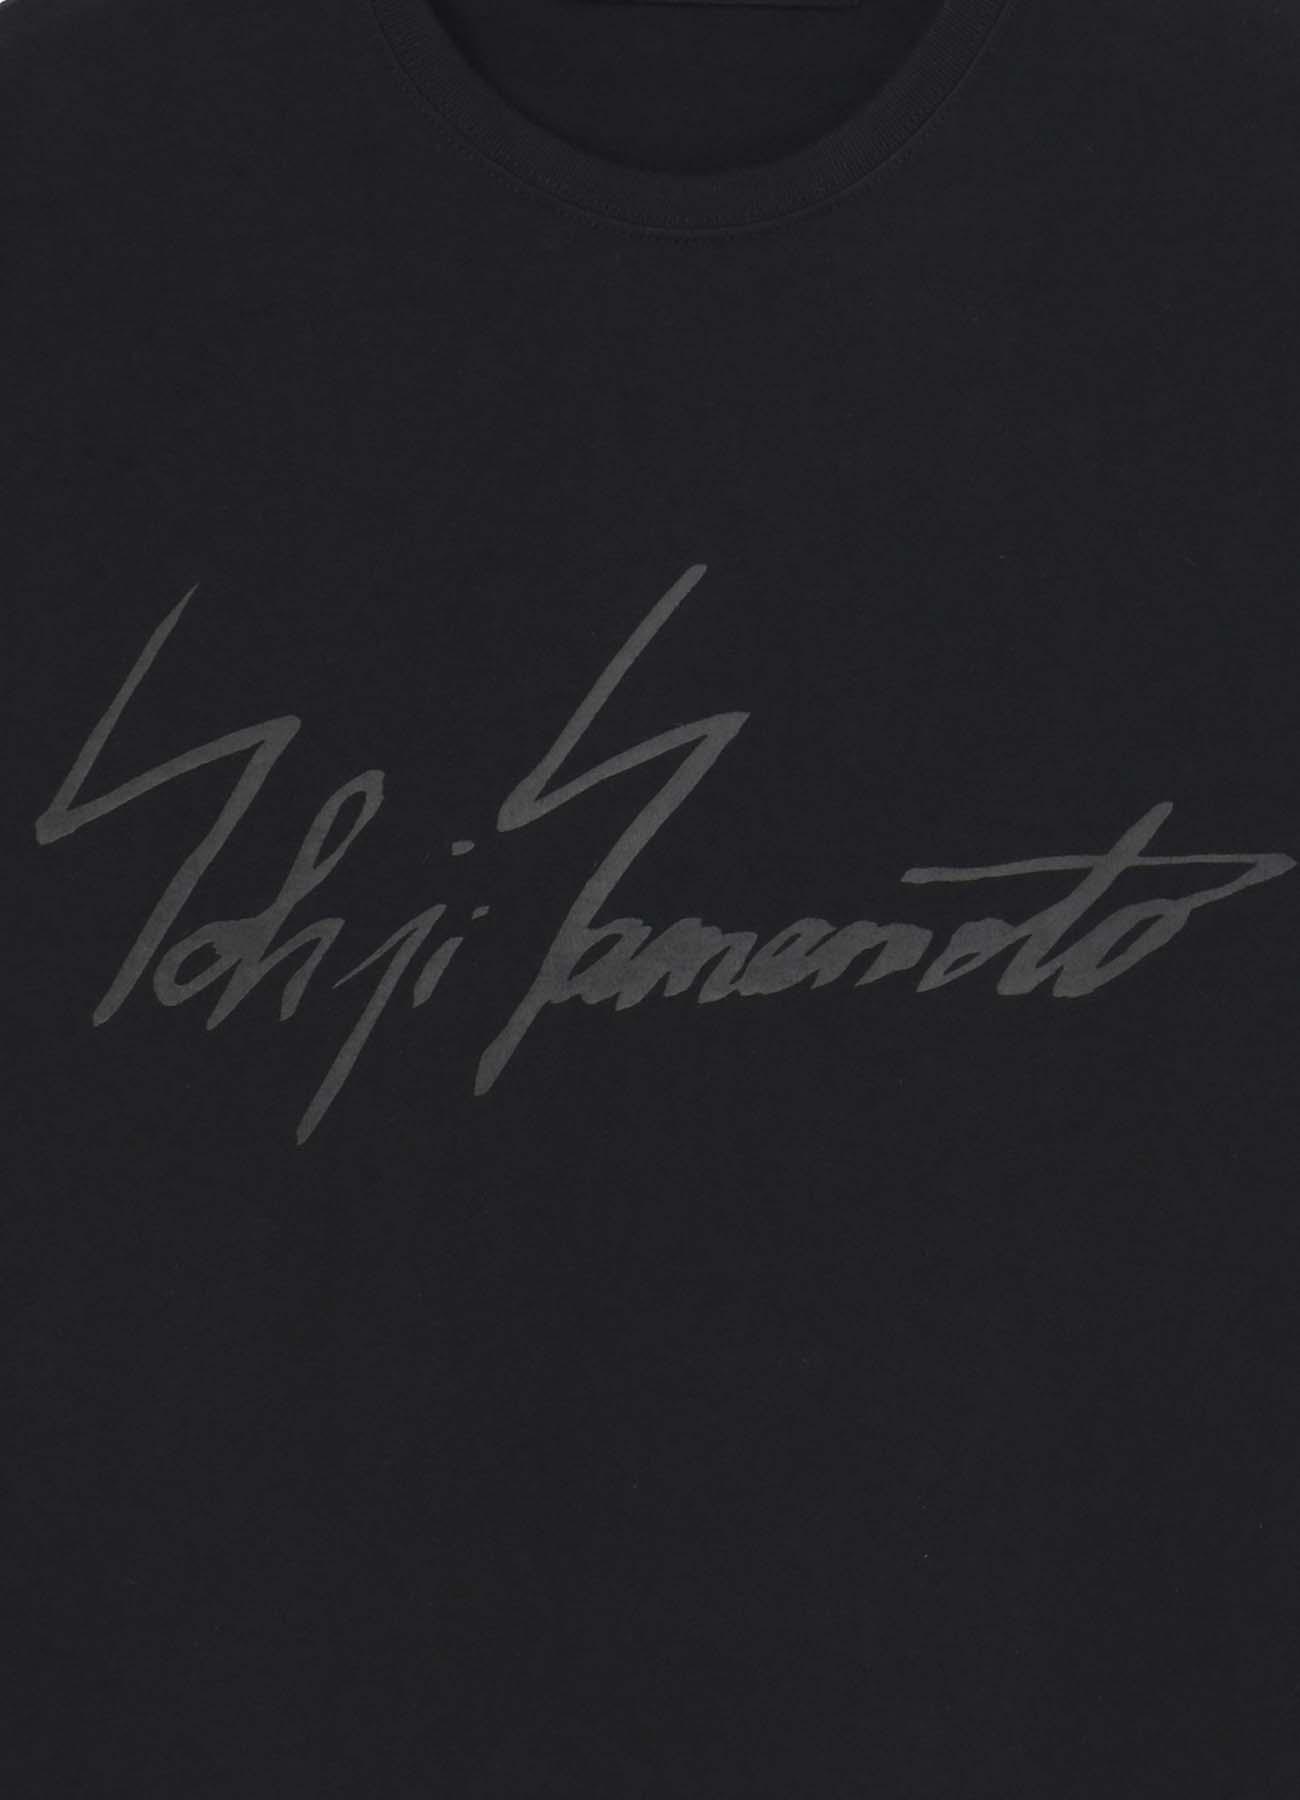 【ONLINE LIMITED】Yohji Yamamoto Handwriting Logo Tshirt